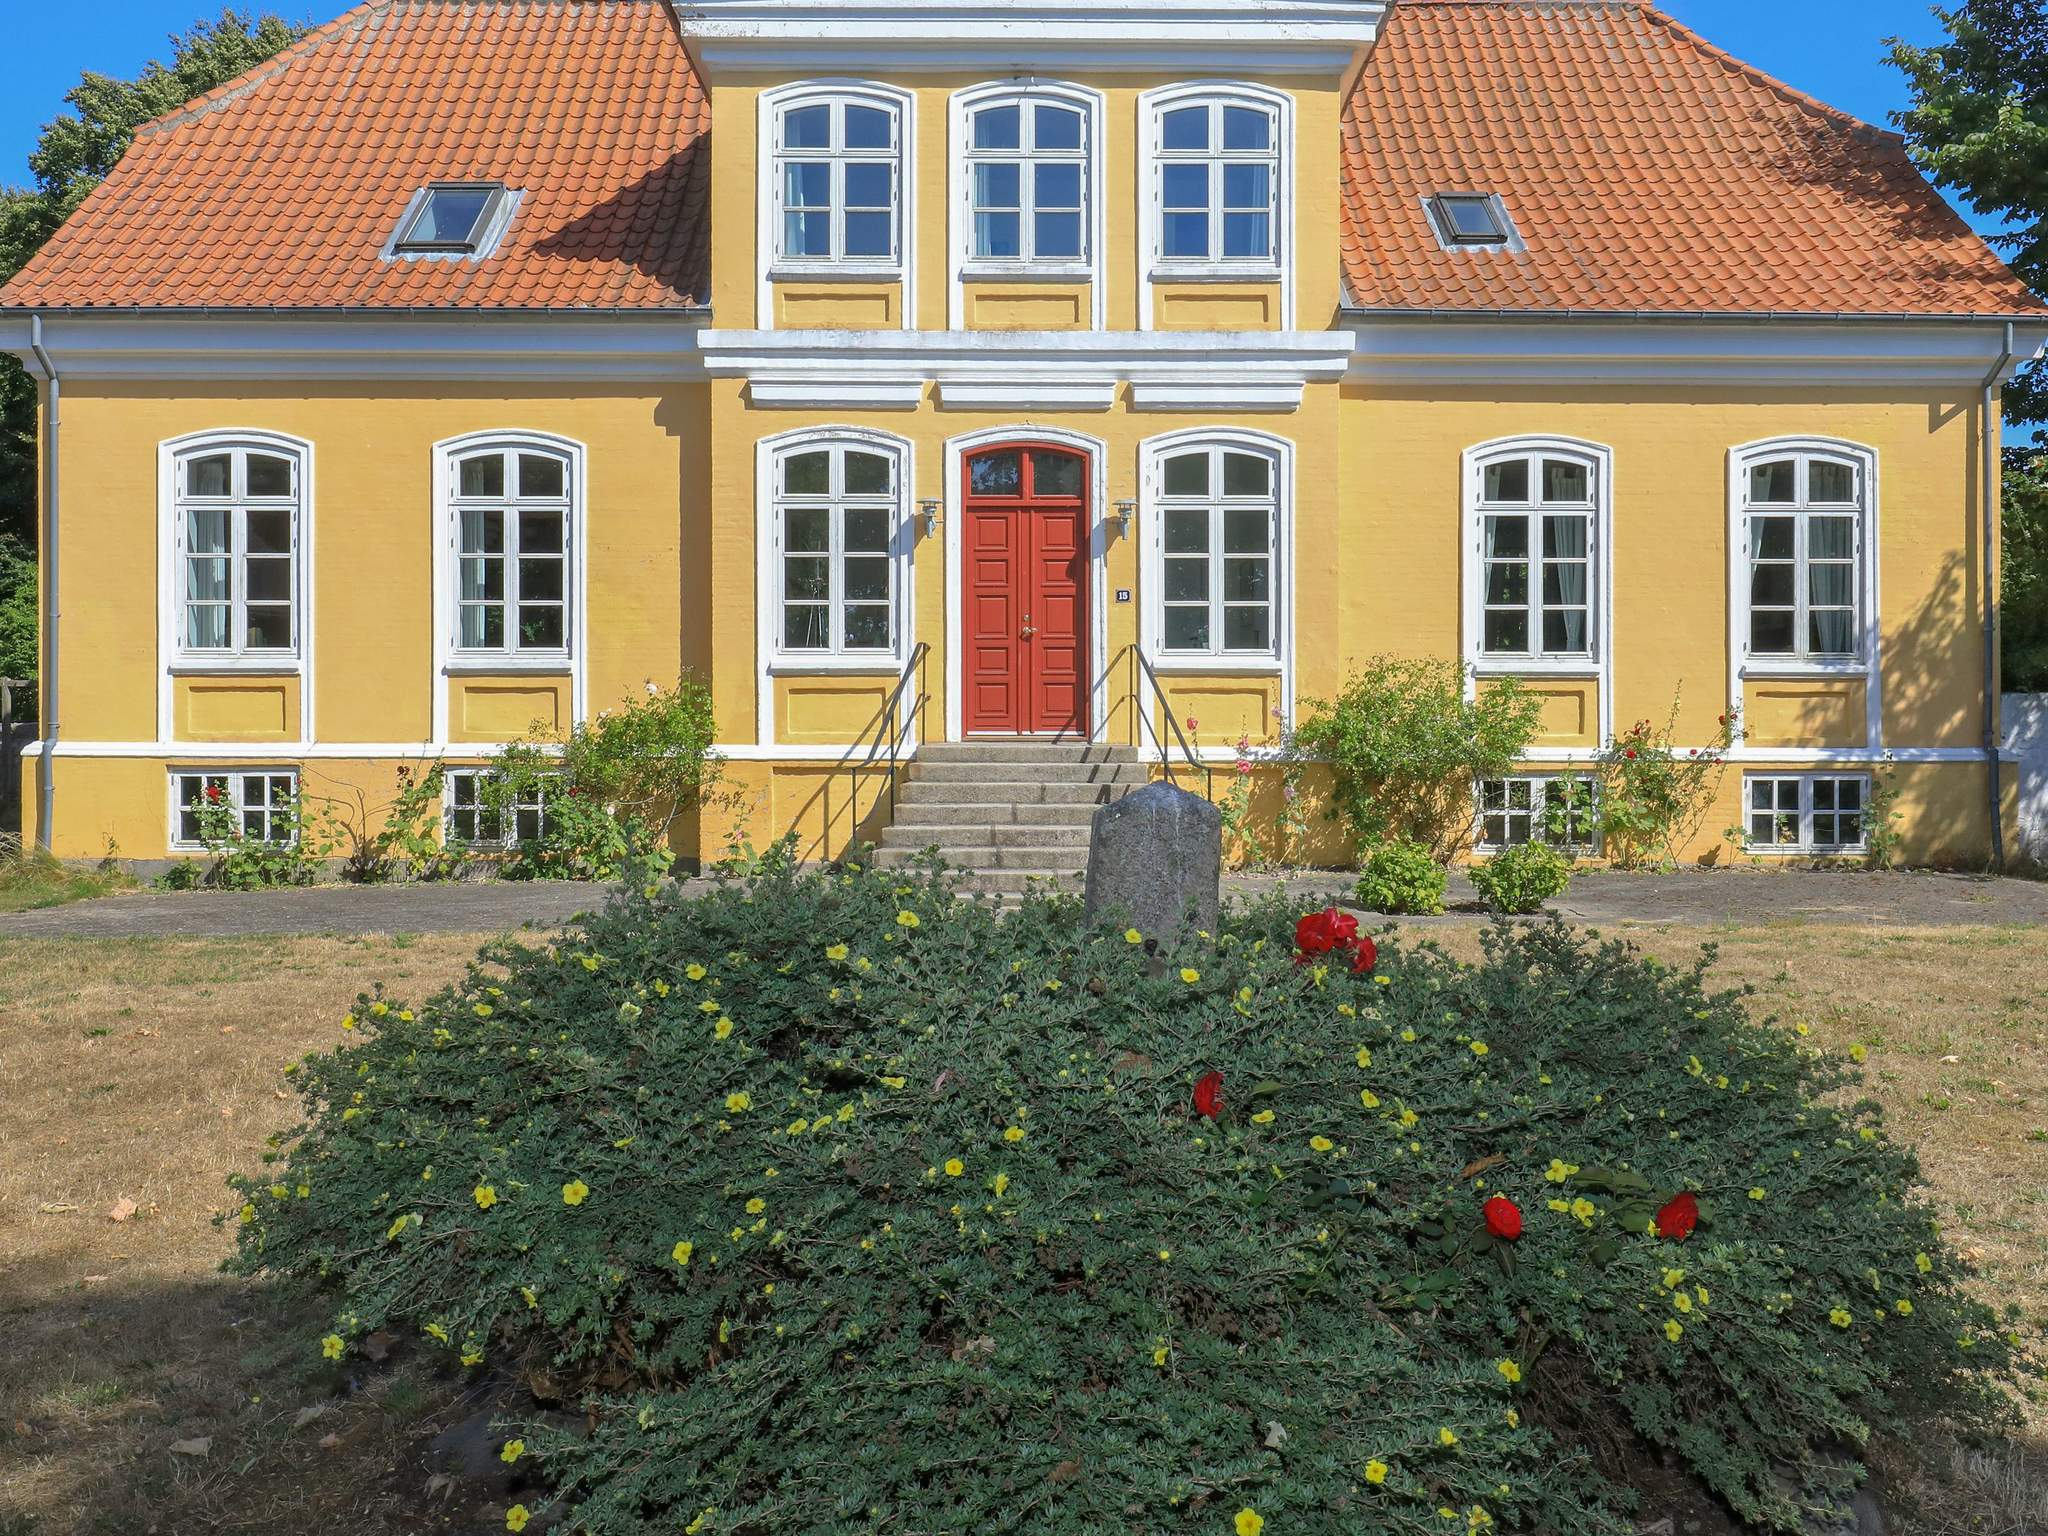 Ferienhaus Bukkemose (2453155), Humble, , Langeland, Dänemark, Bild 25